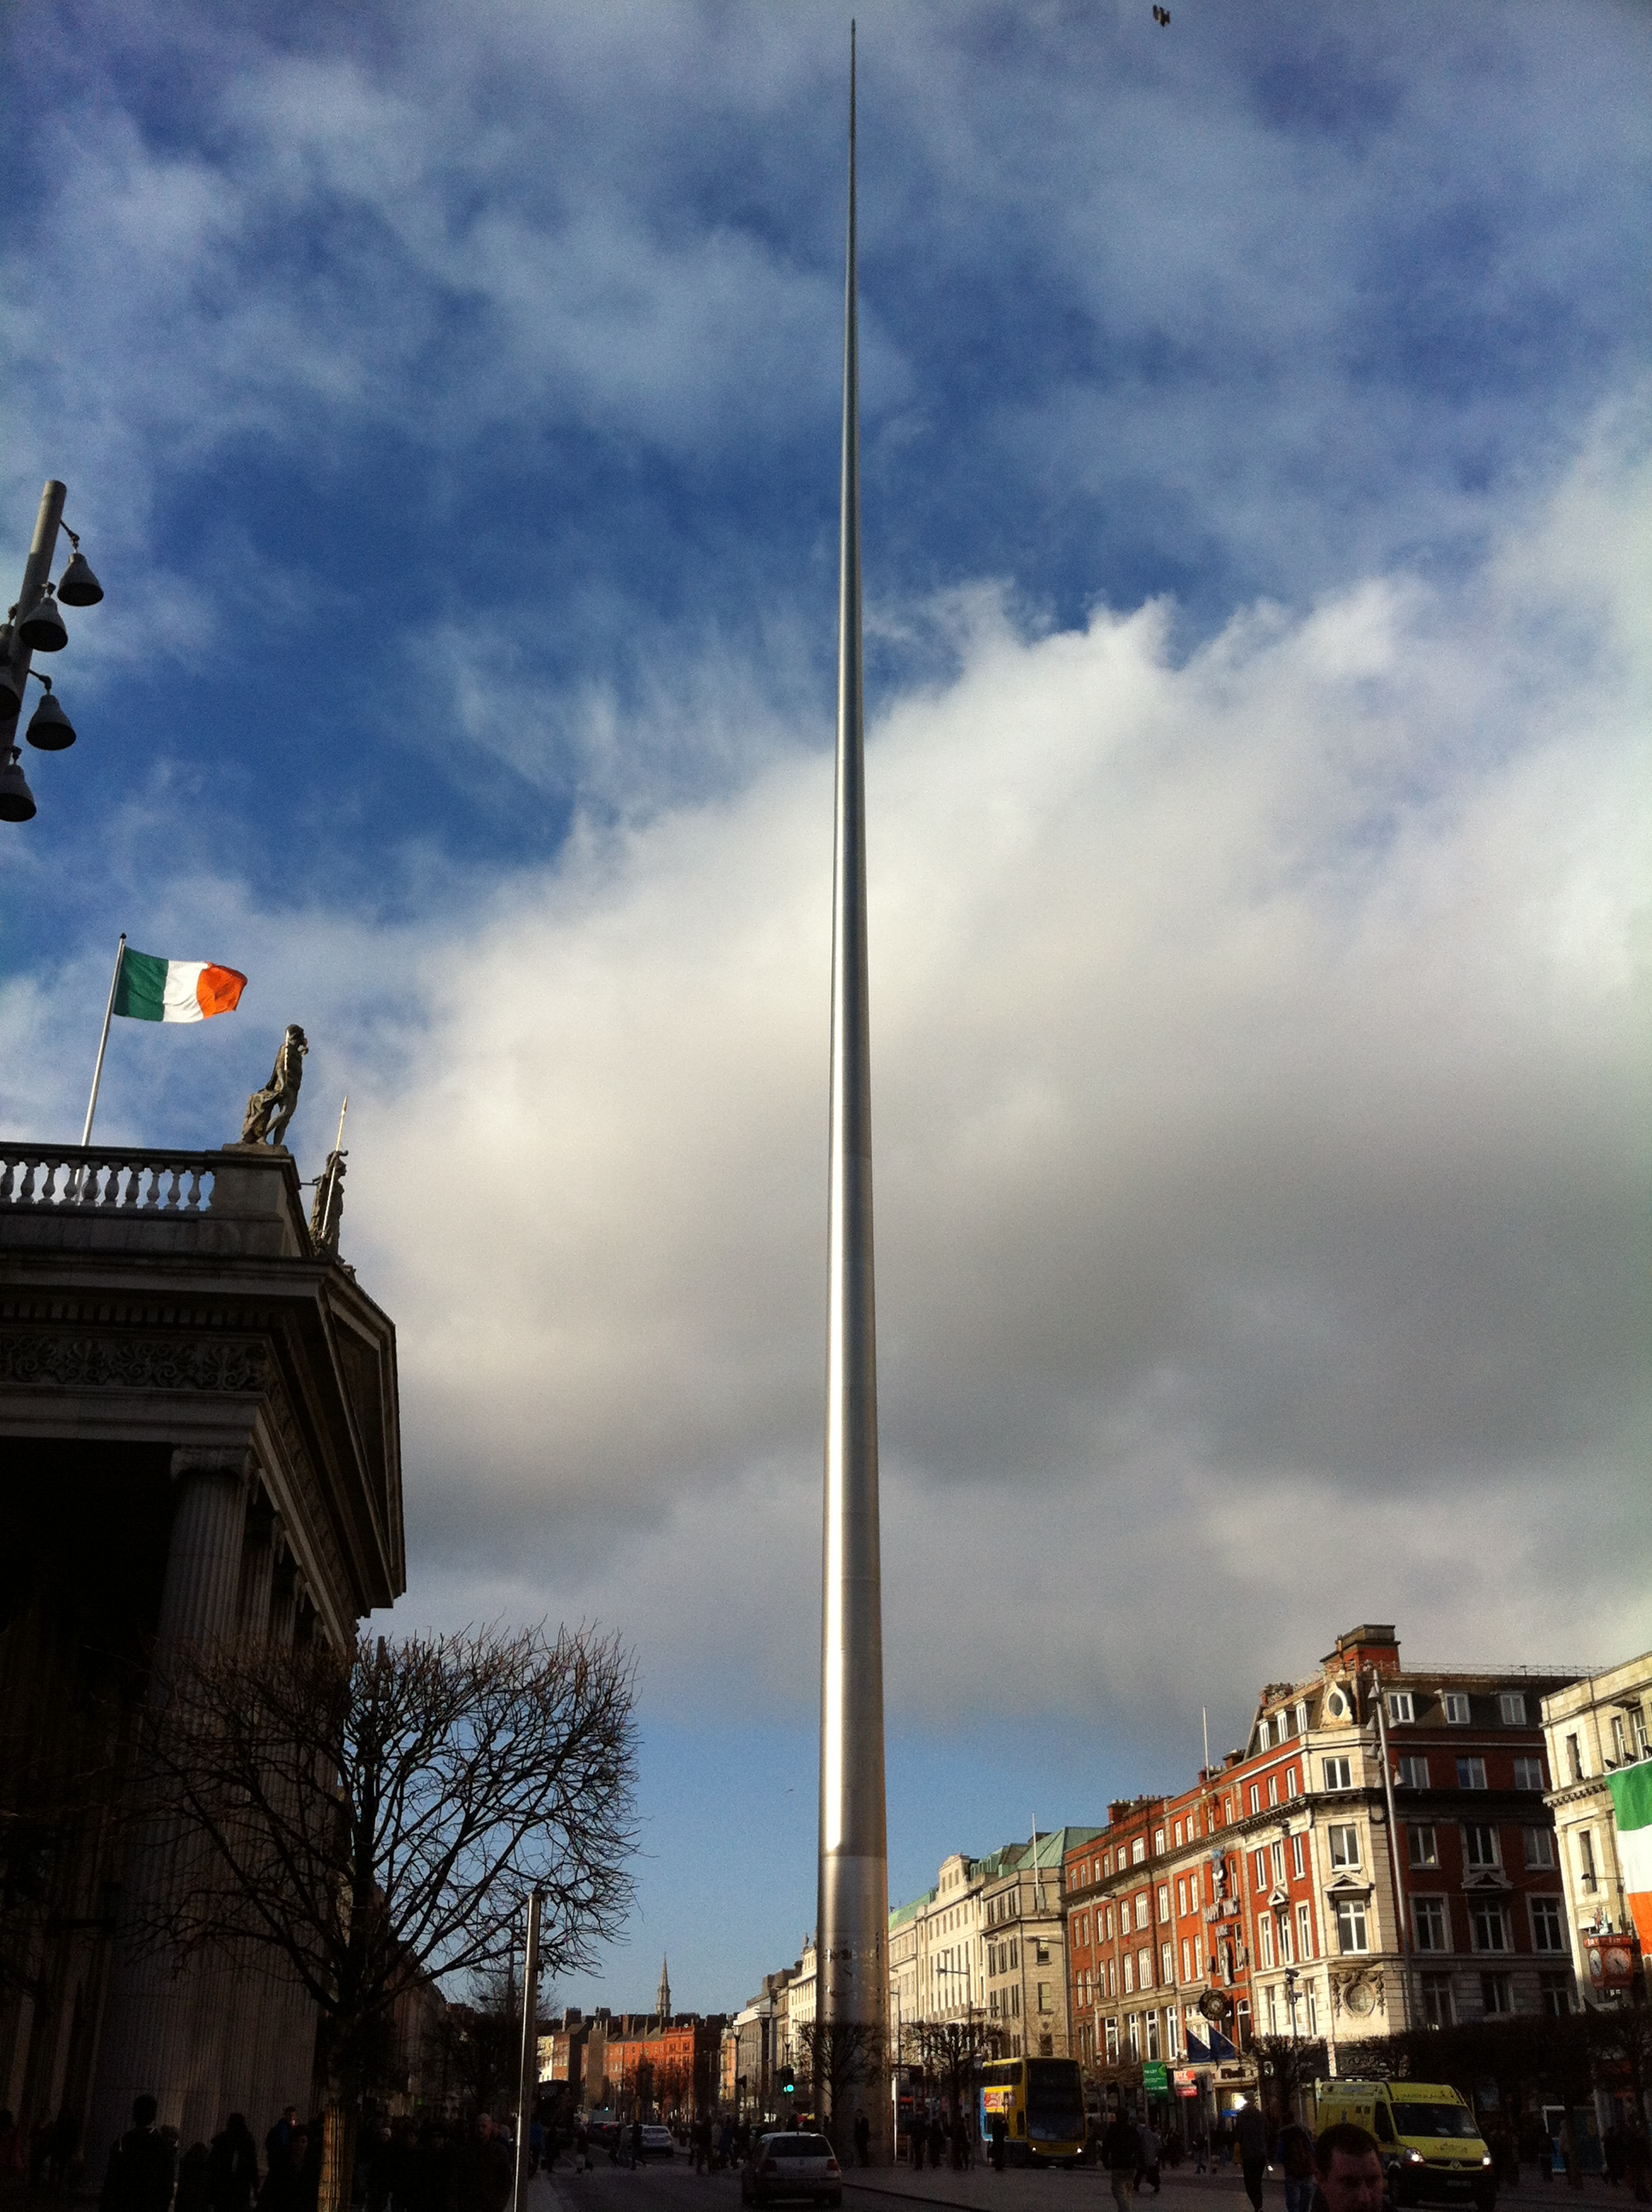 Dublins Spire